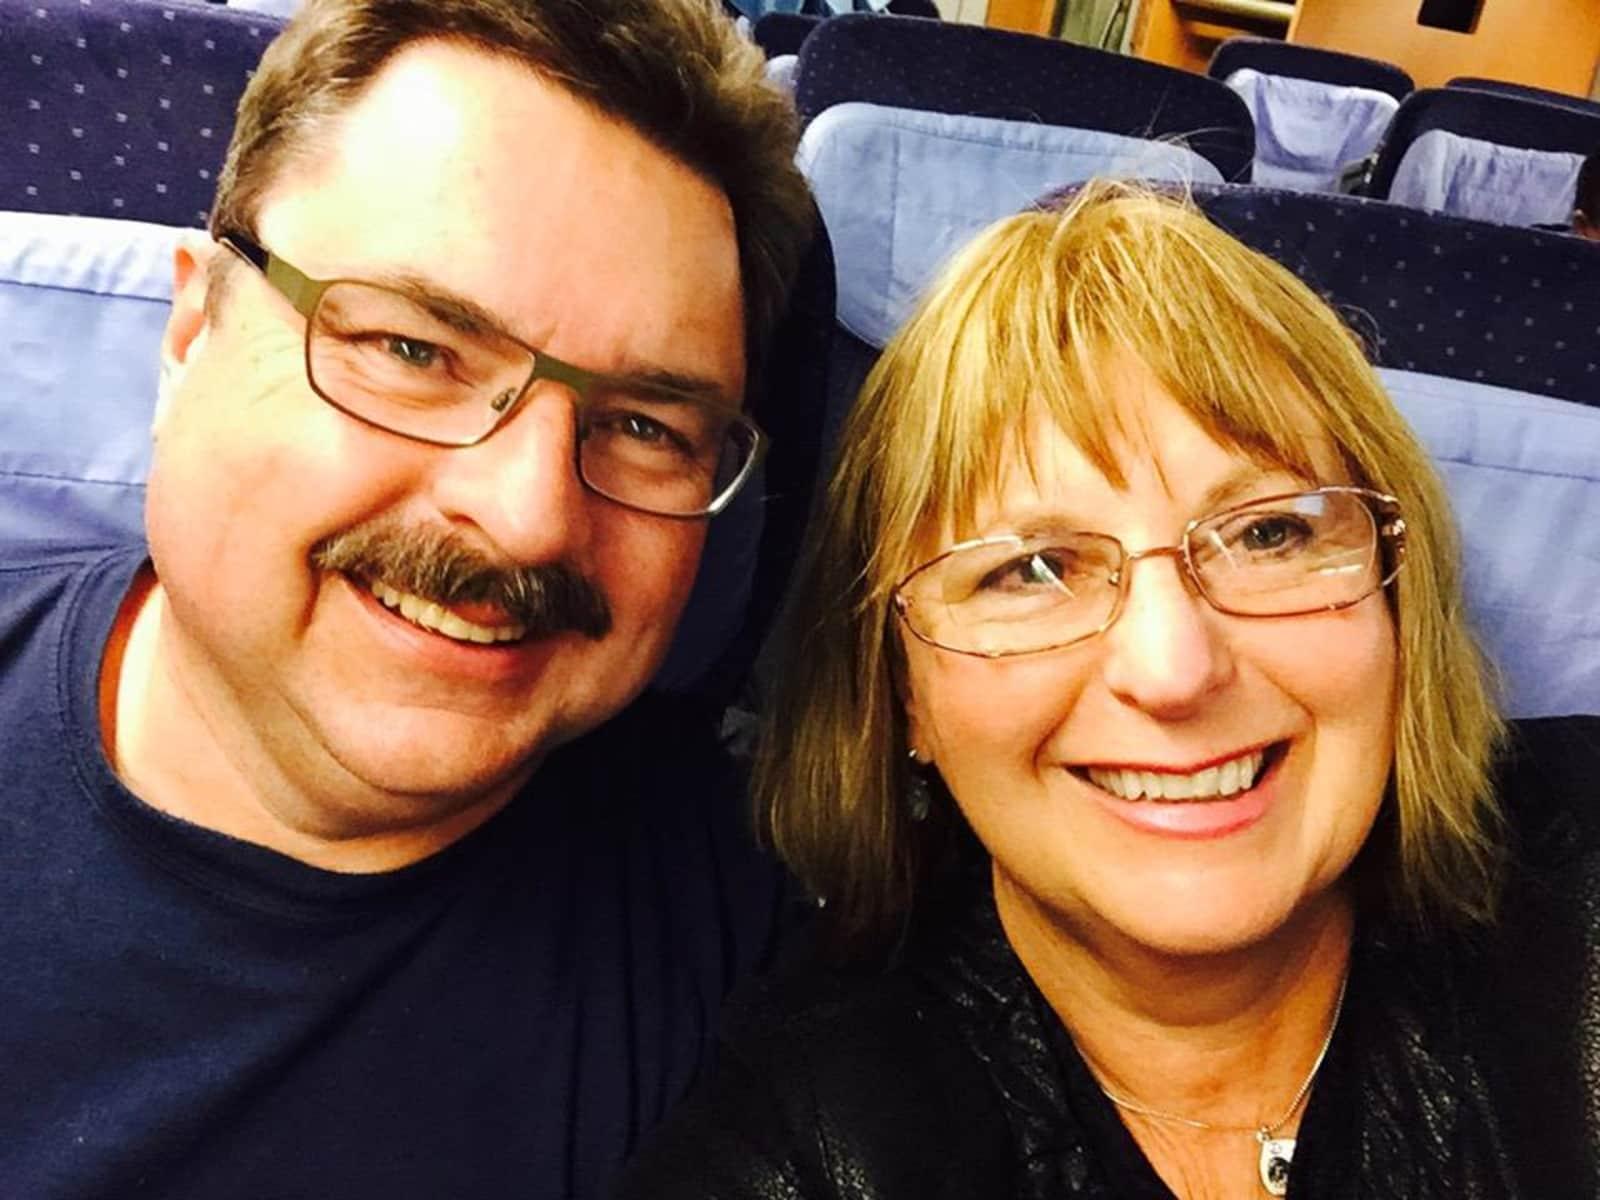 Linda from Cambridge, Ontario, Canada